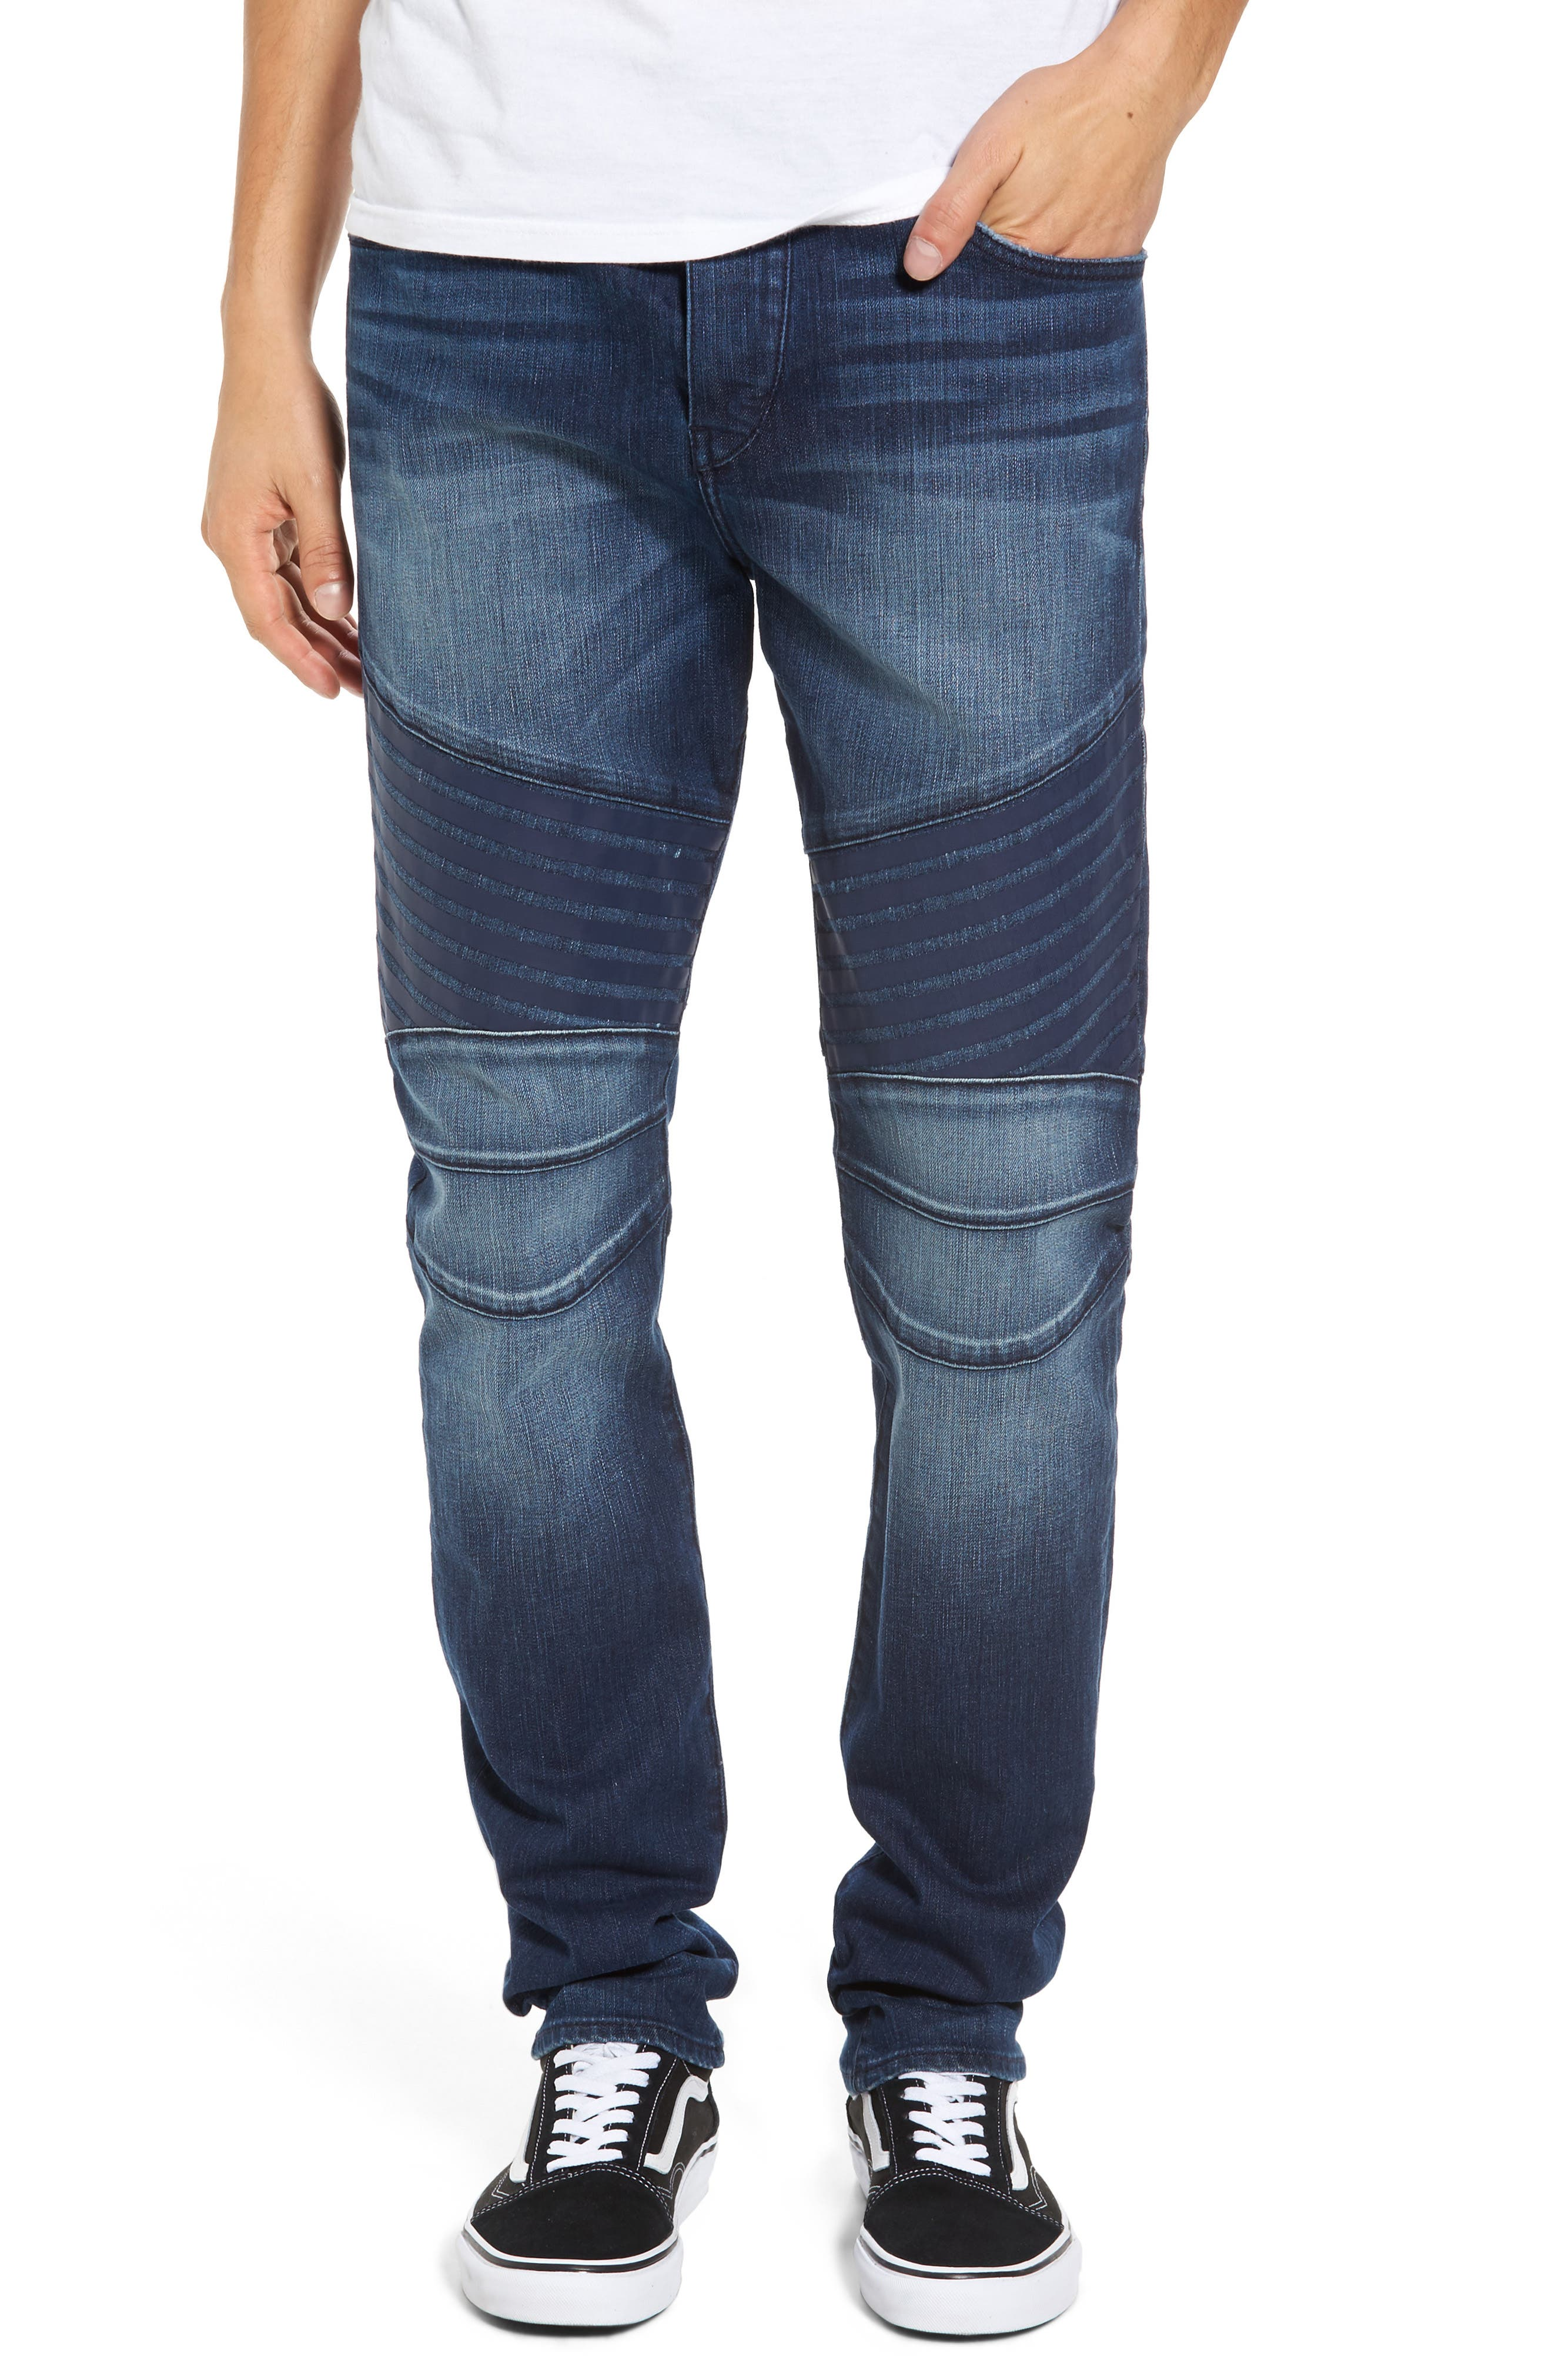 Alternate Image 1 Selected - True Religion Brand Jeans Rocco Biker Skinny Fit Jeans (Rebel Race)